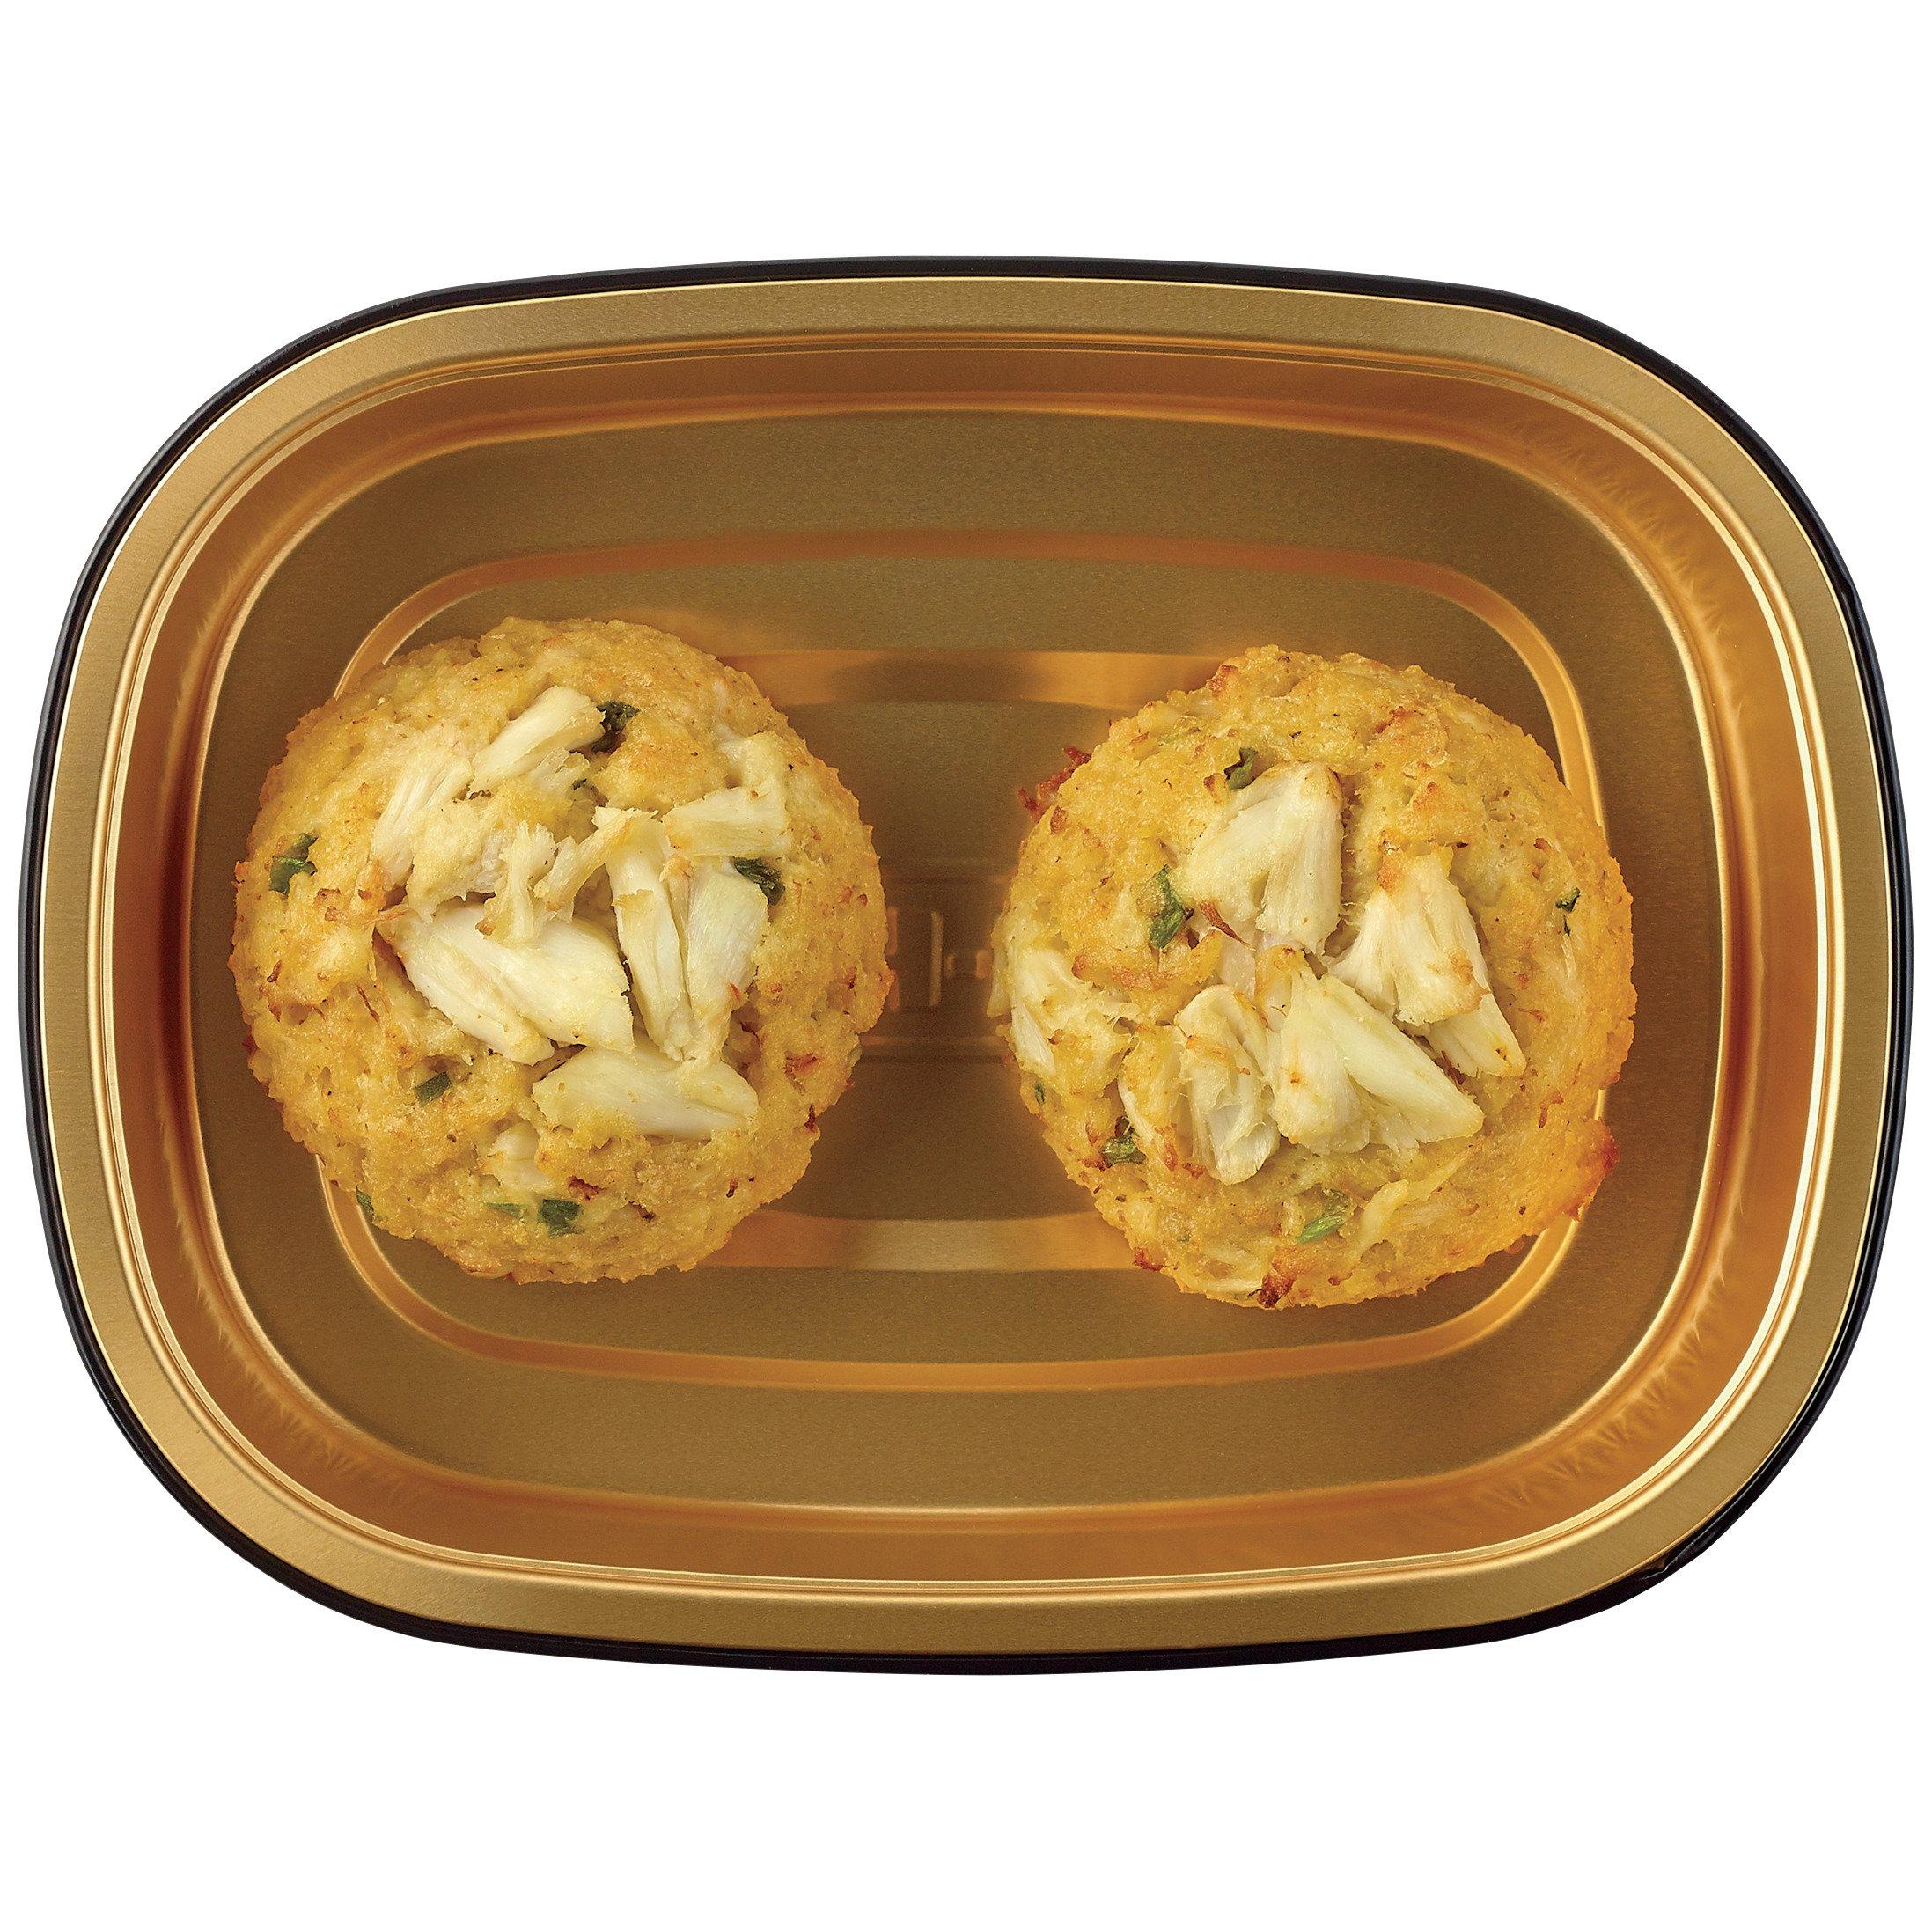 H E B Meal Simple Jumbo Lump Crab Cakes Shop Entrees Sides At H E B